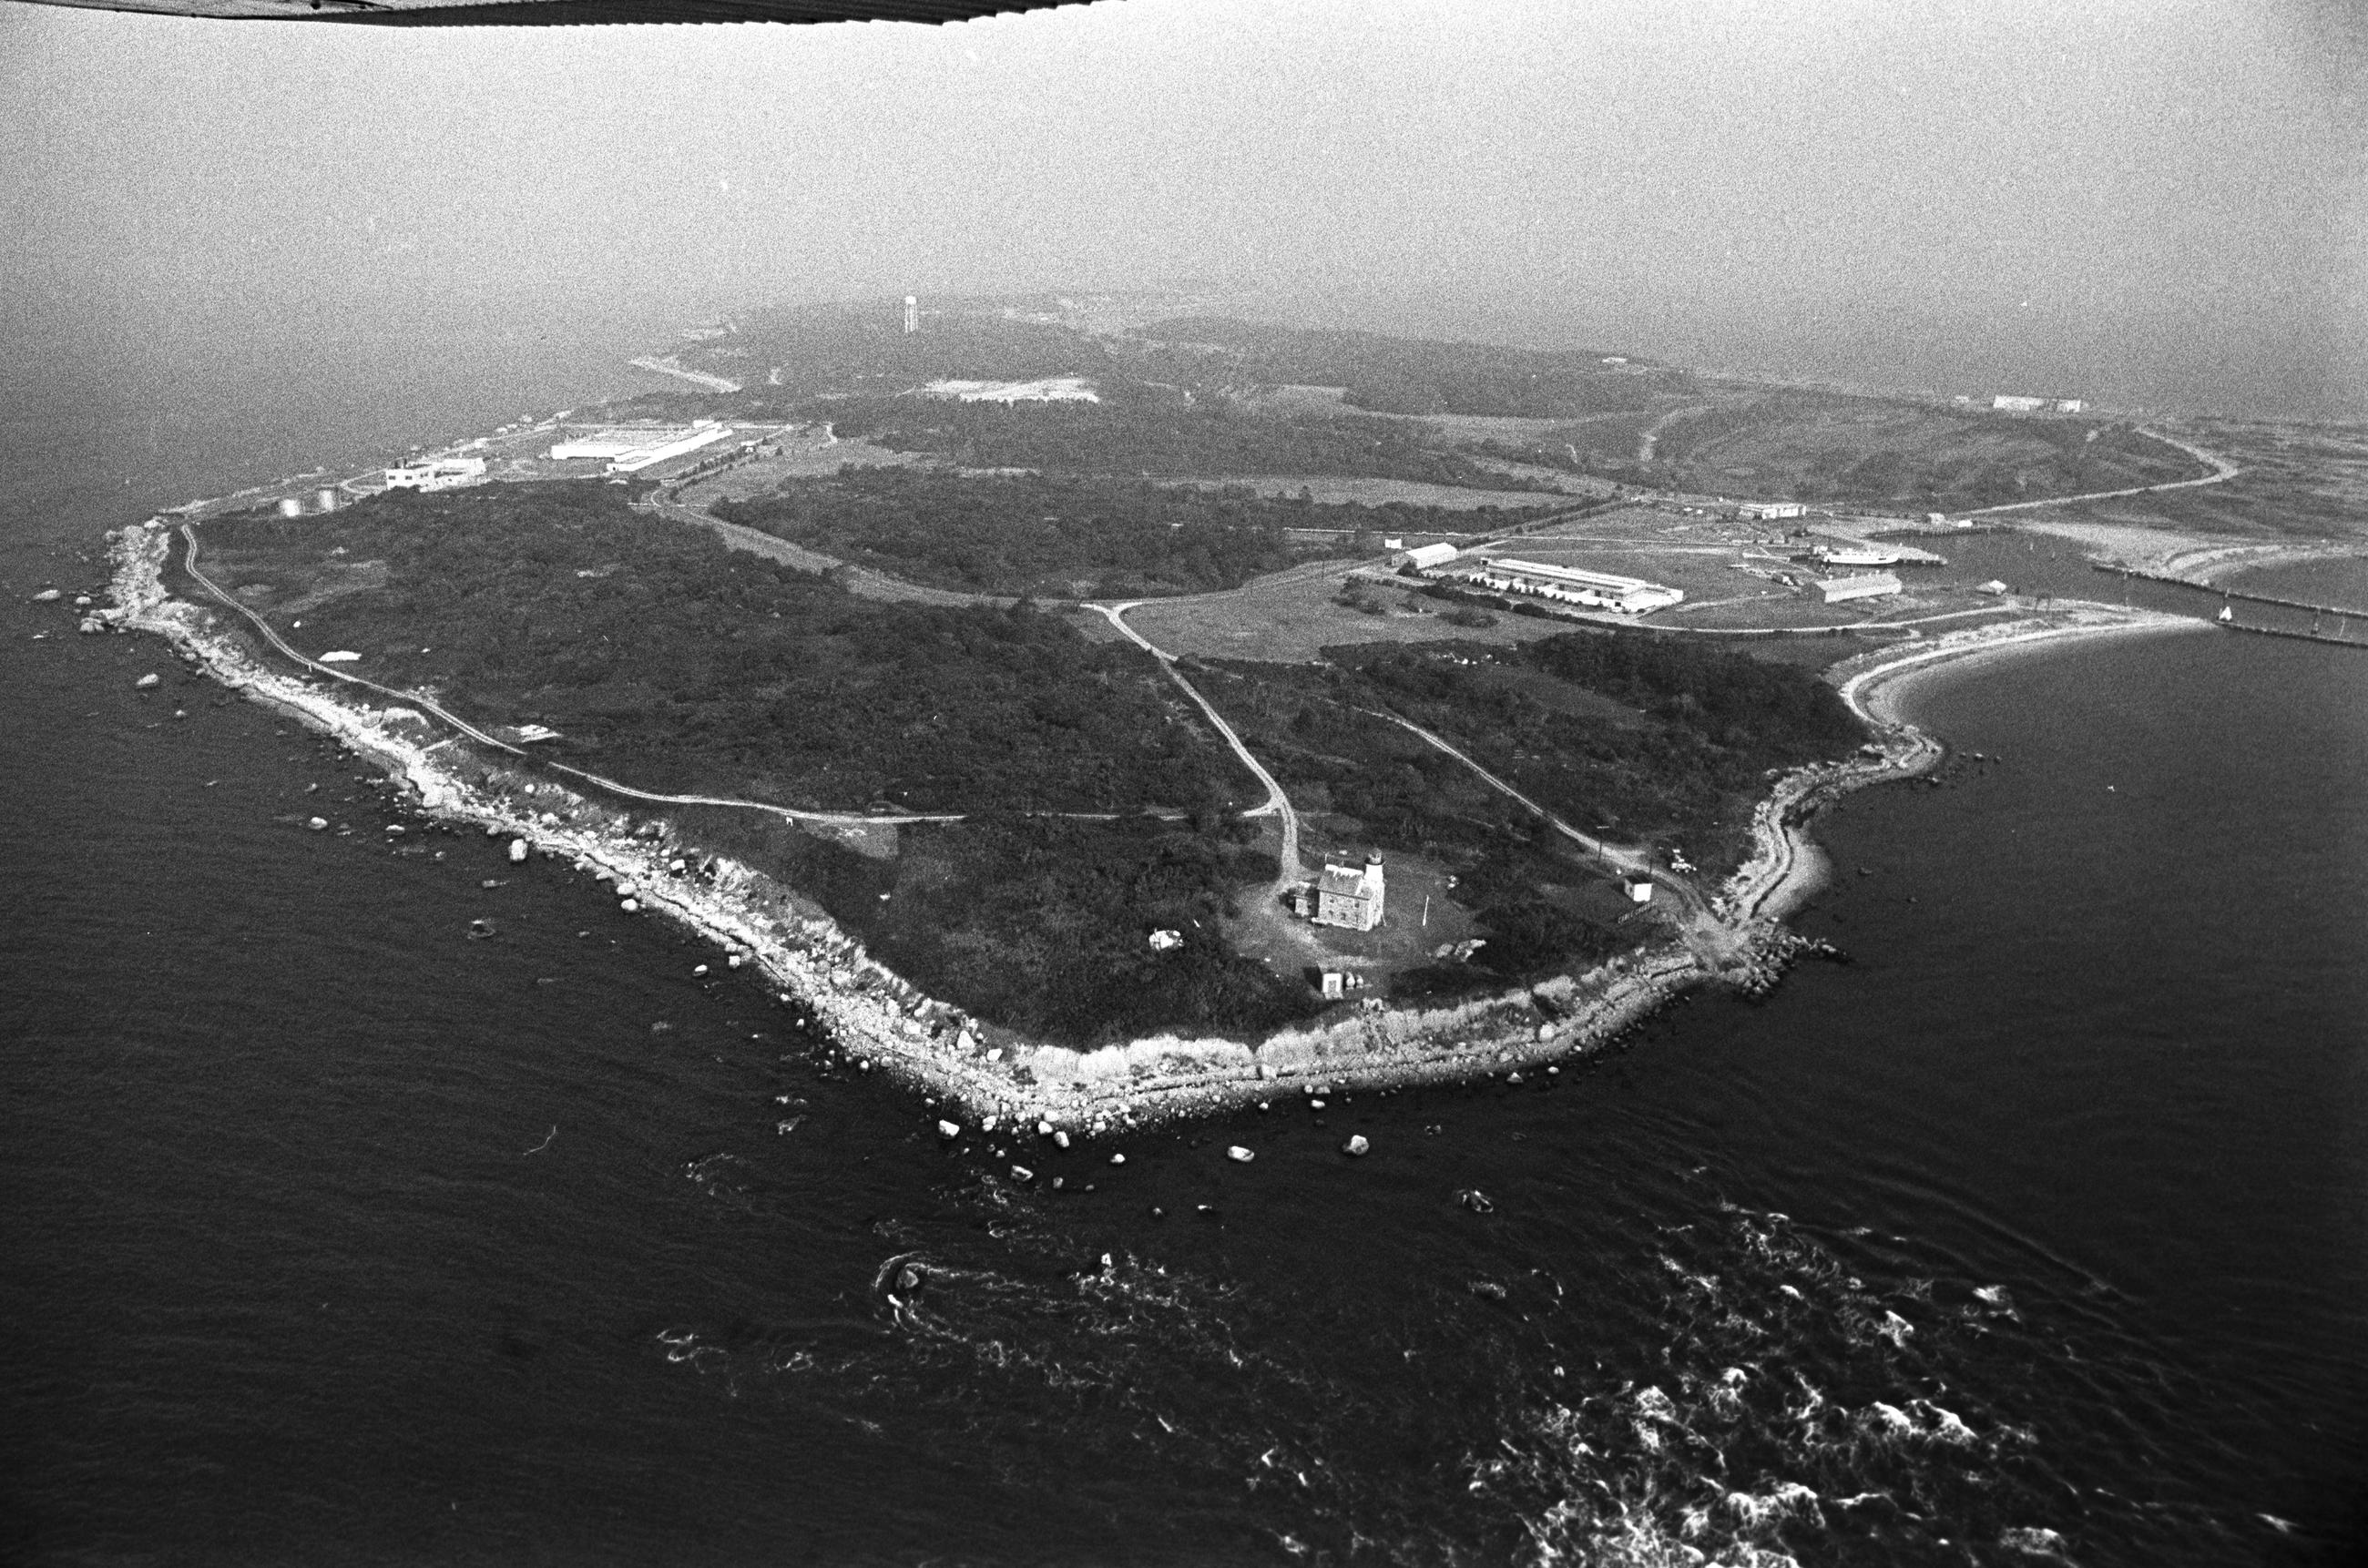 Mysterious island of Plum